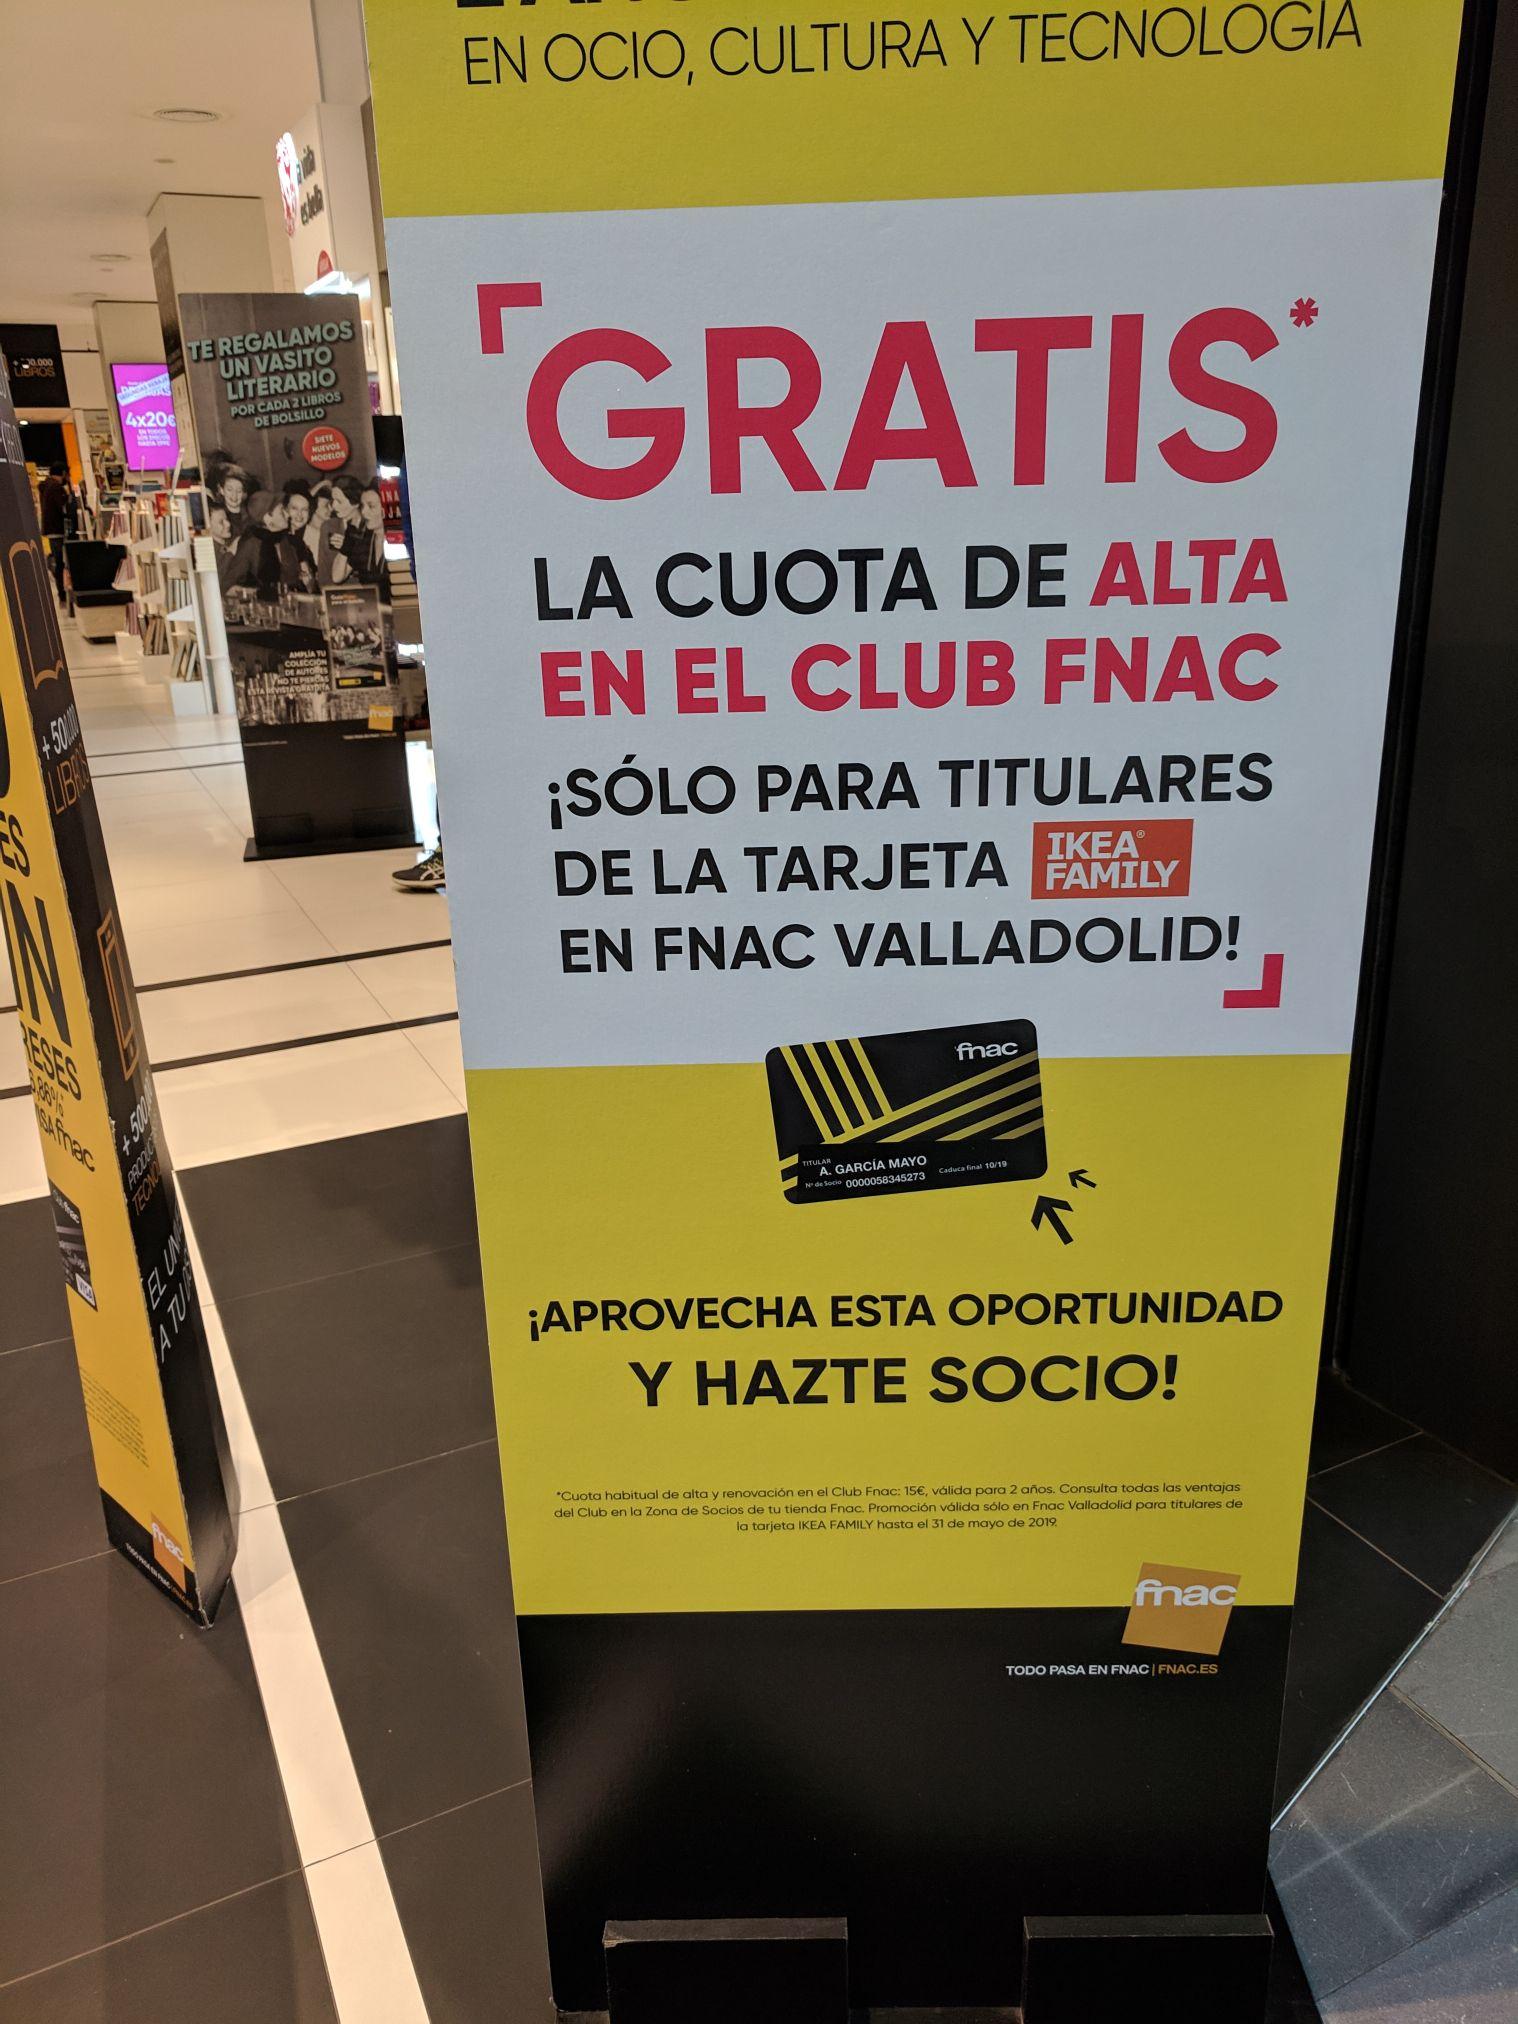 Tarjeta de socio Fnac gratis en Fnac Valladolid presentando la Ikea famili